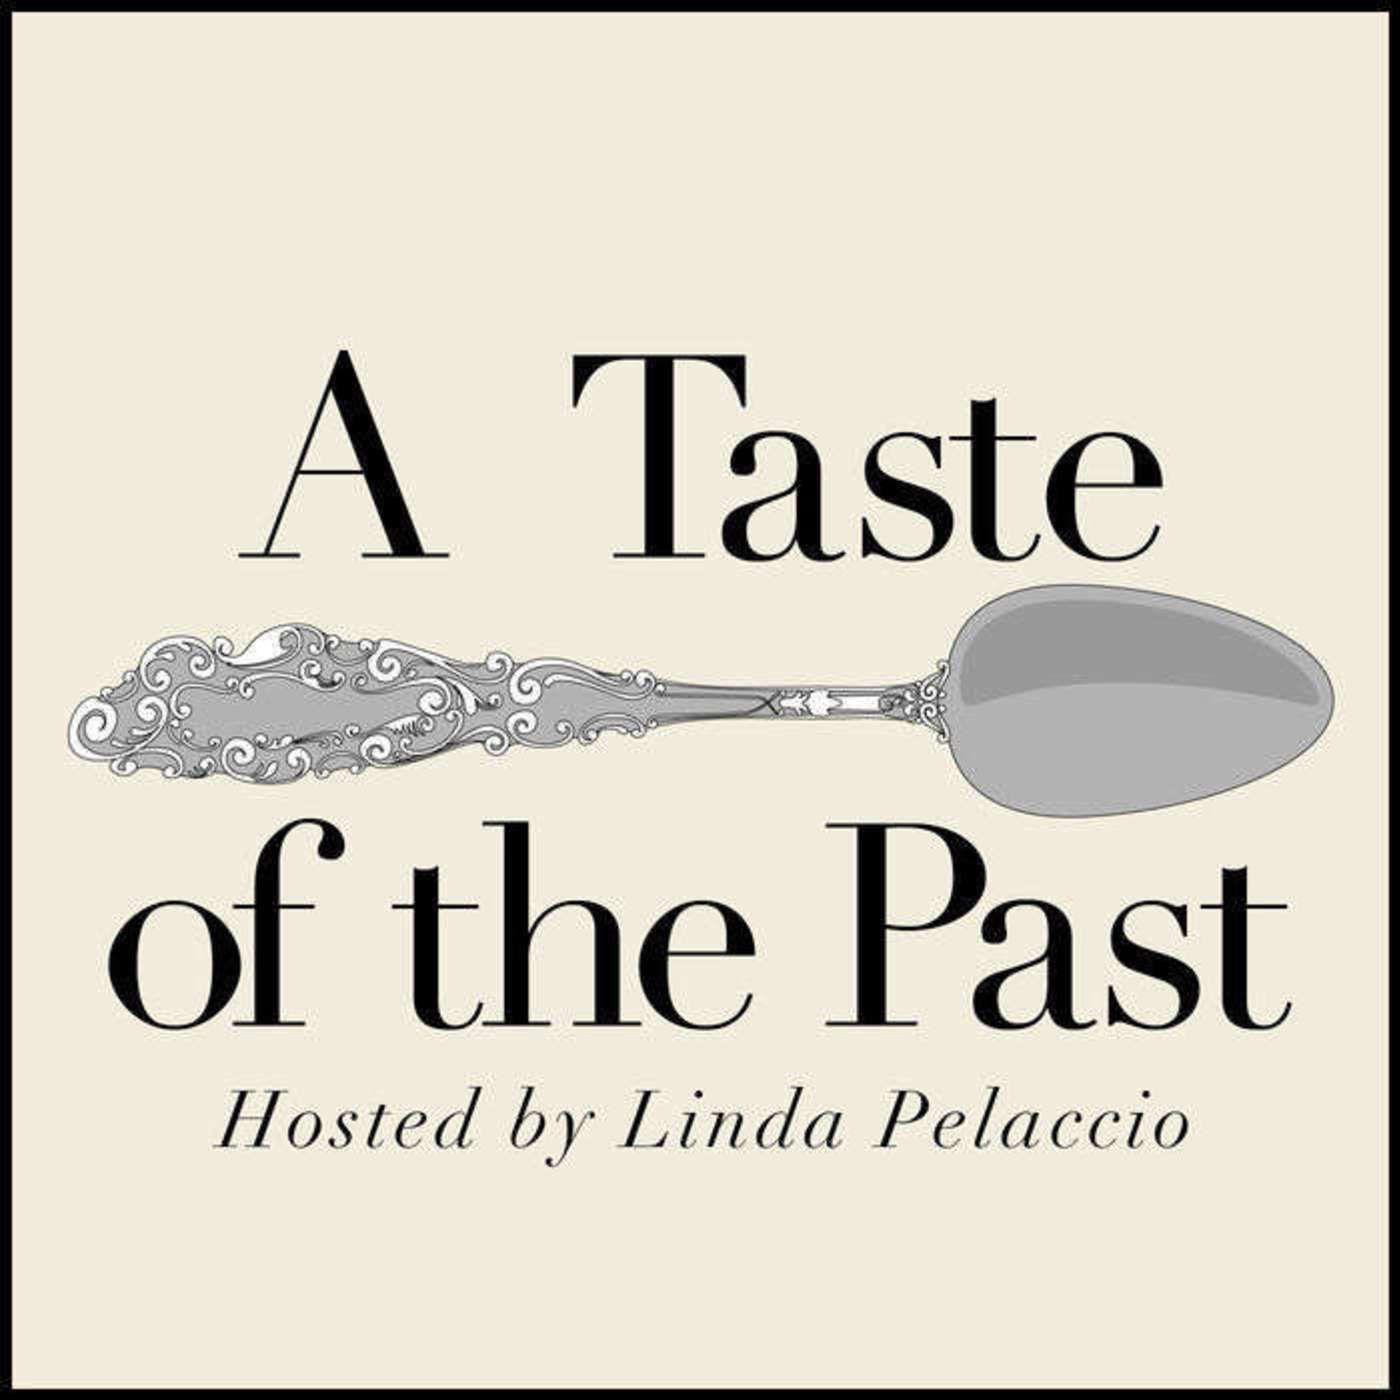 Episode 104: Origins of the Modern Cookbook